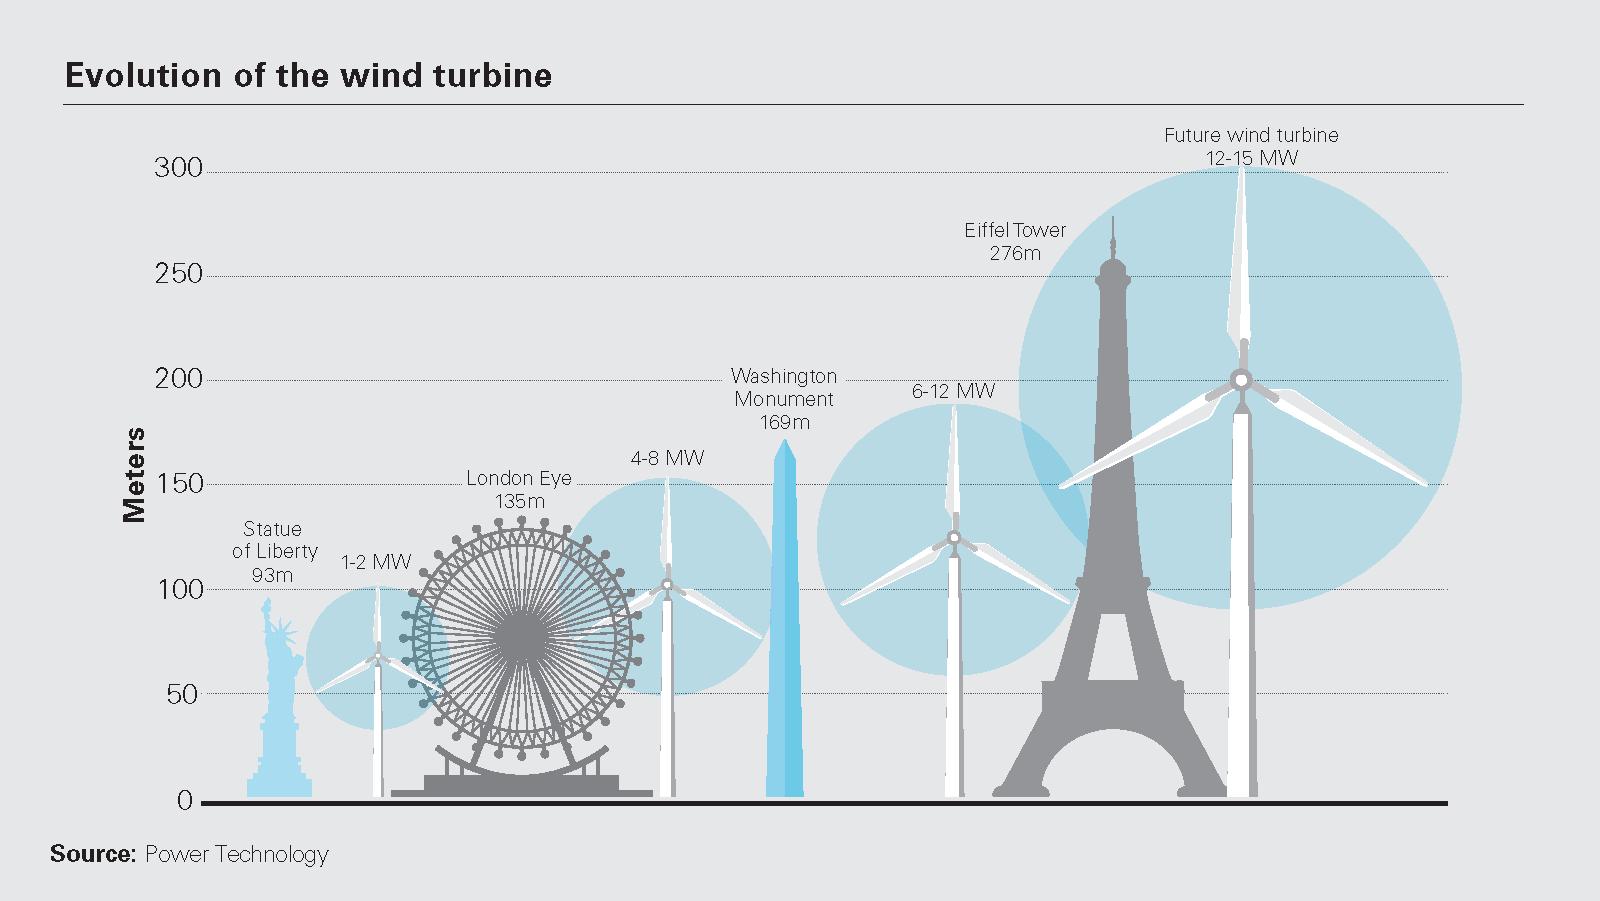 Evolution of the wind turbine